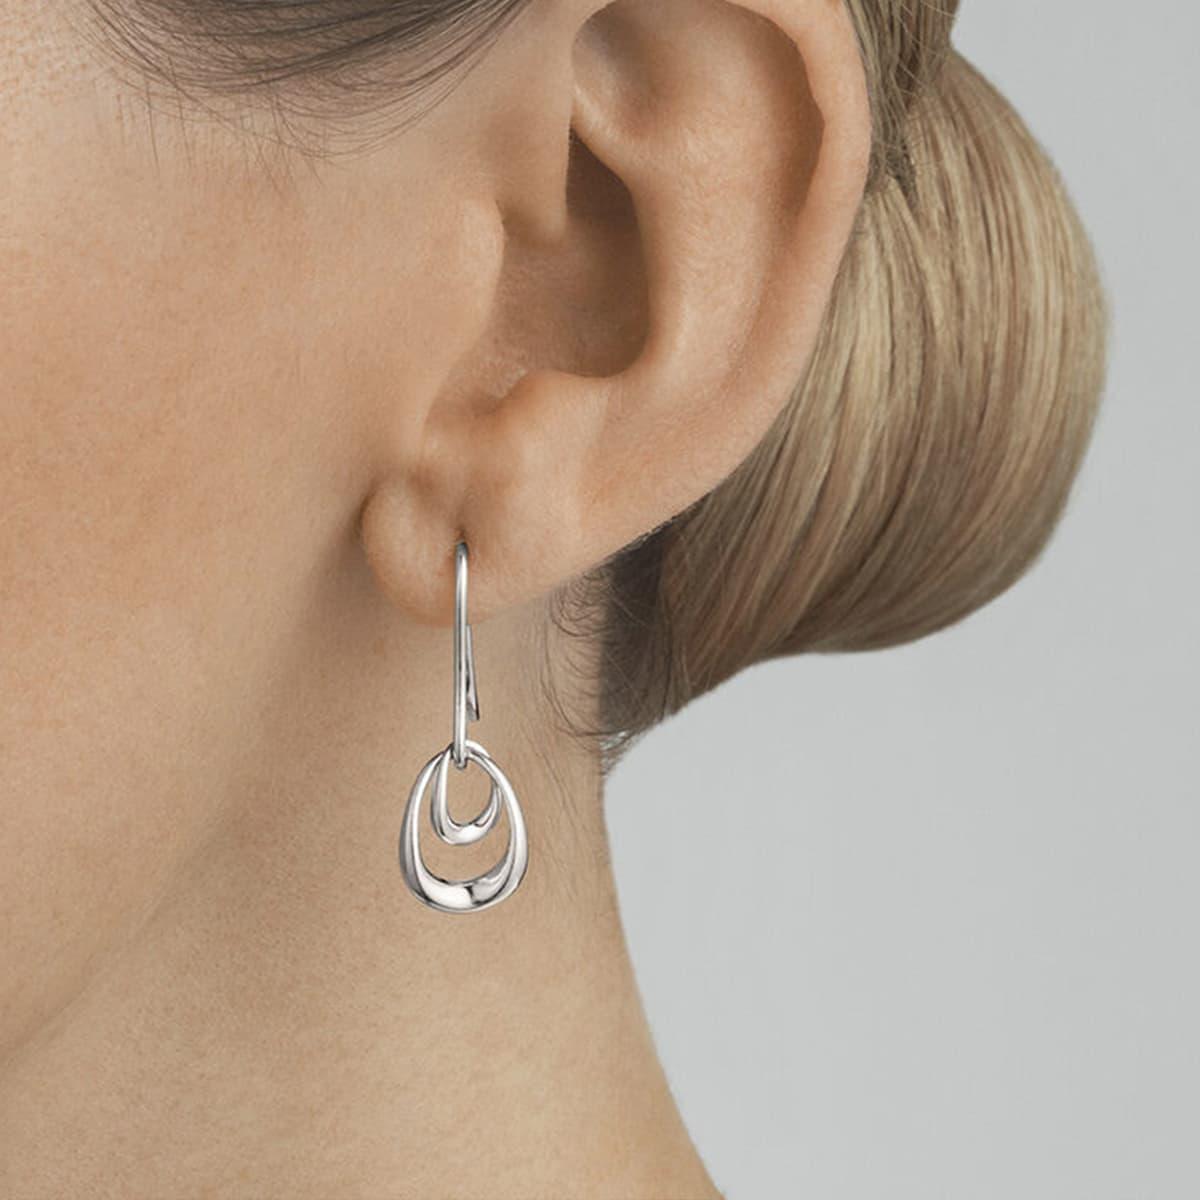 Sterling Silver Offspring Earrings